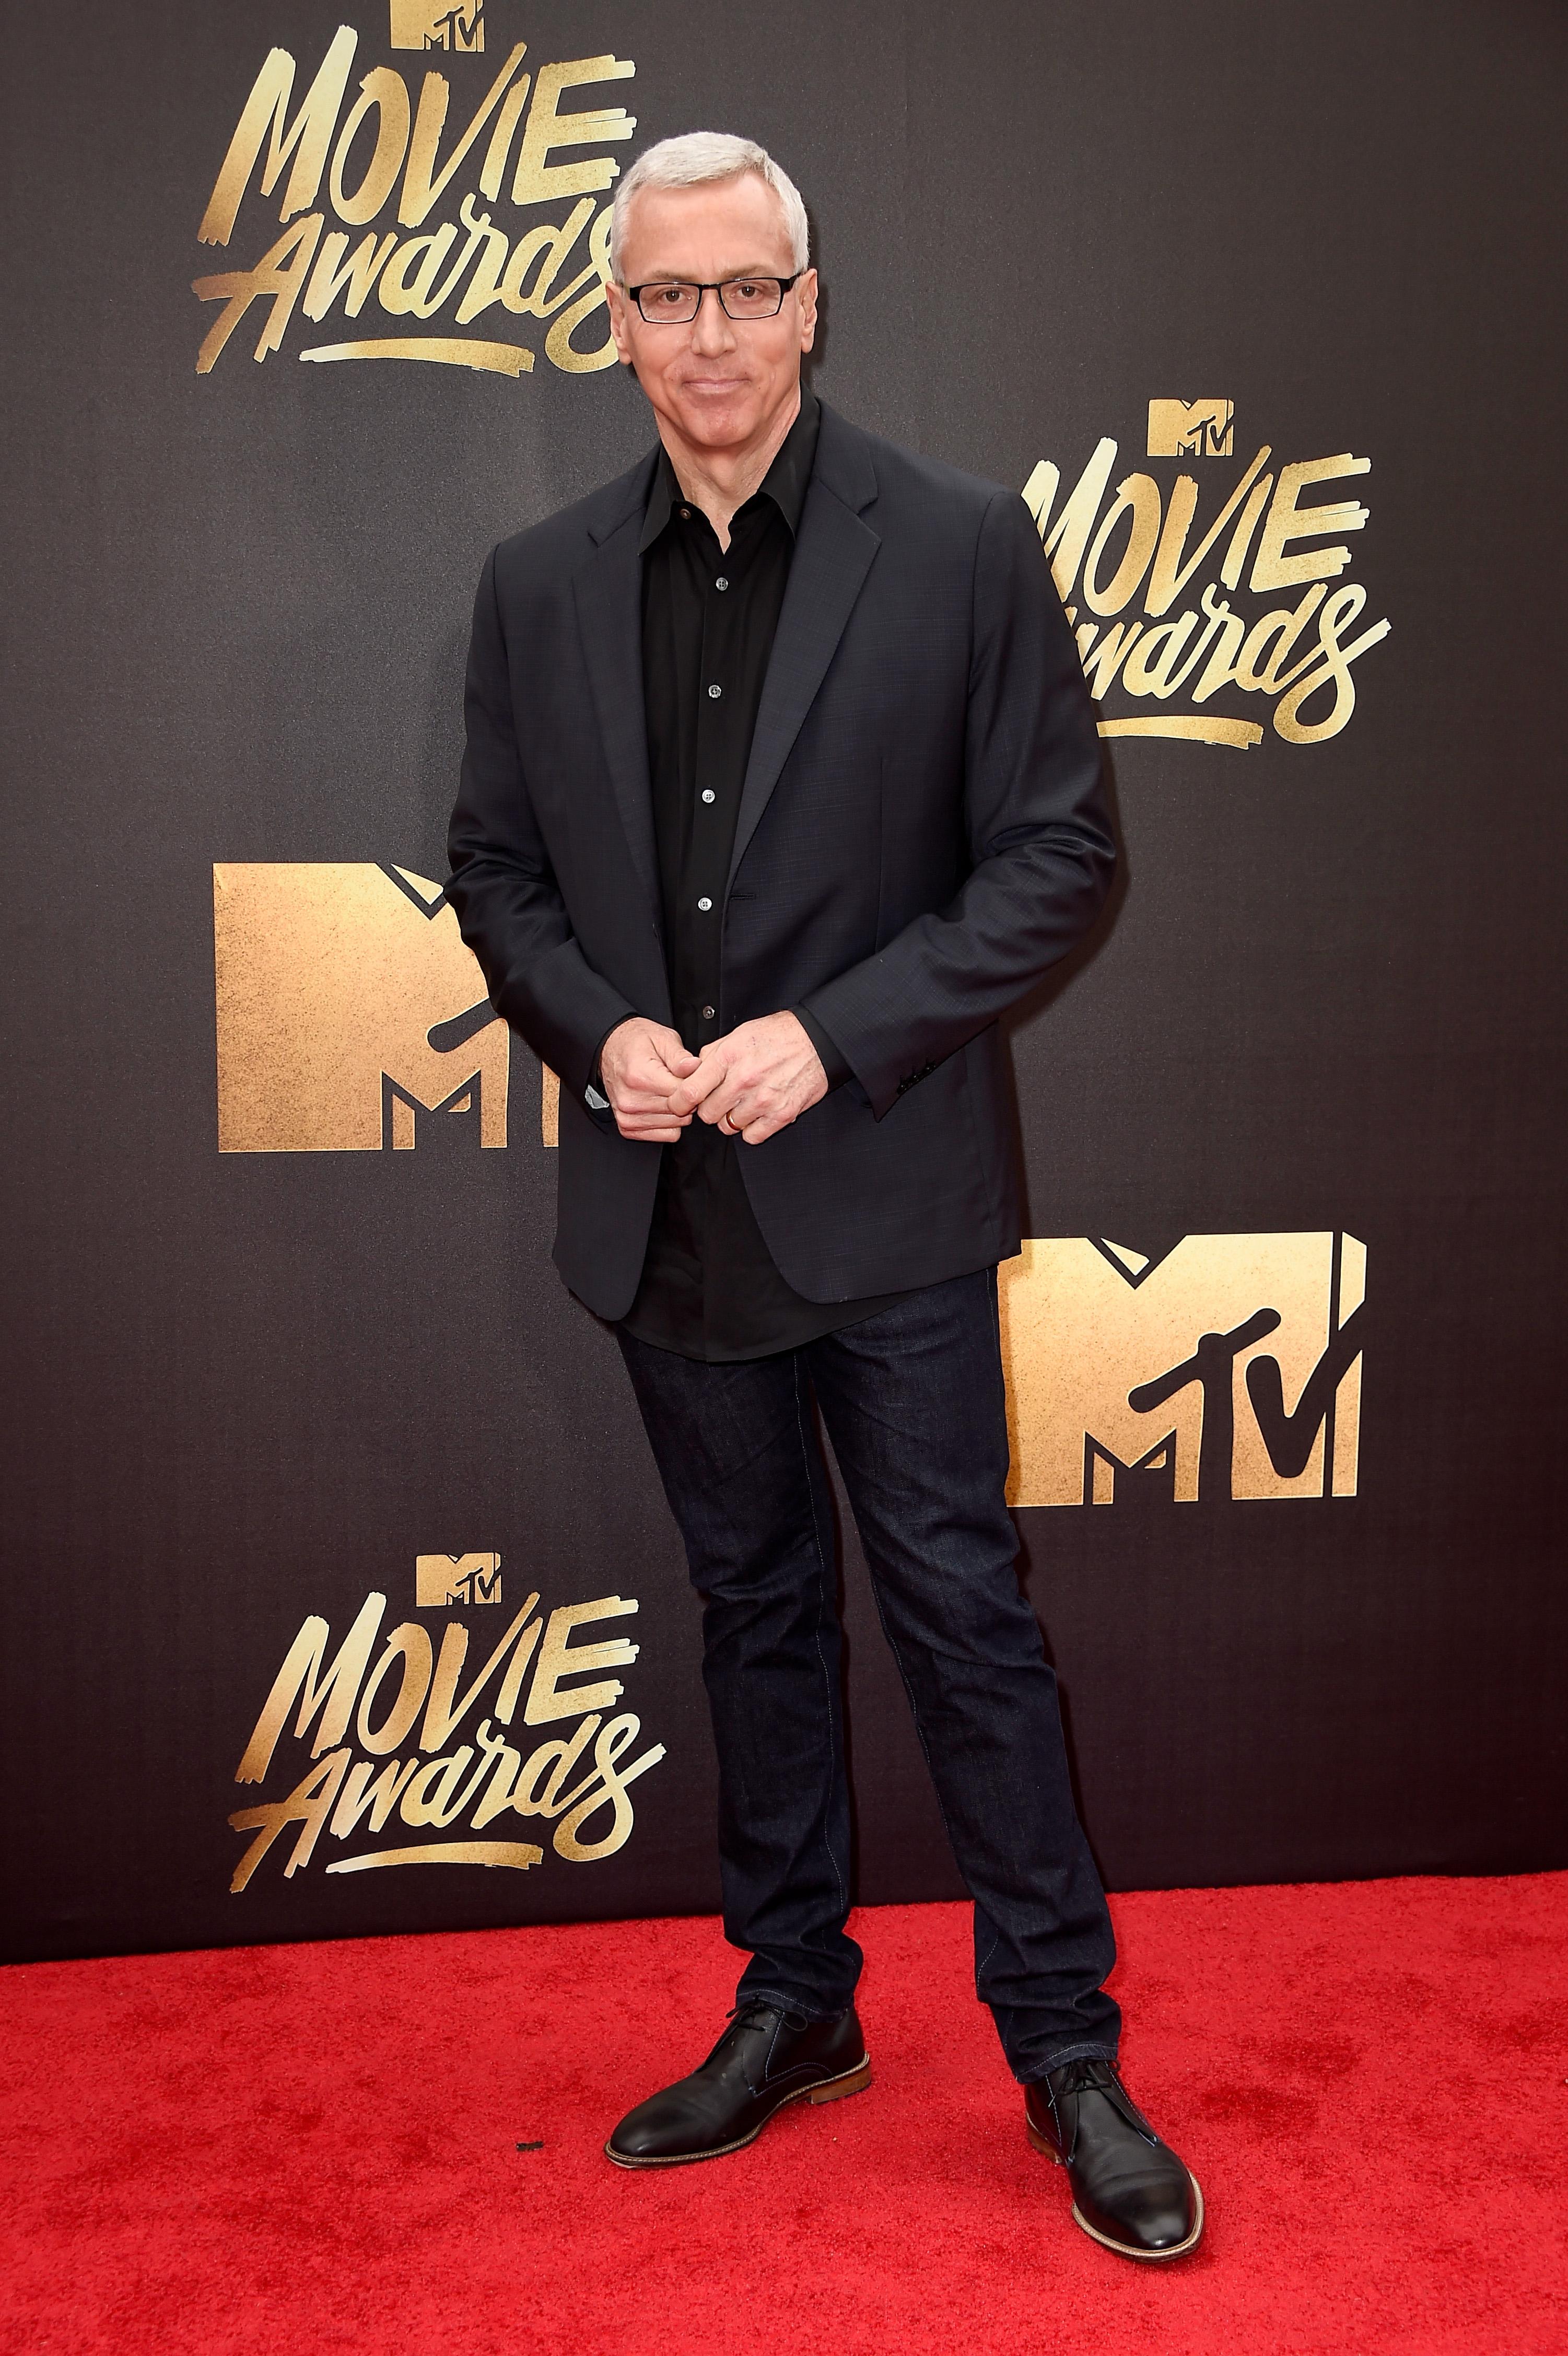 Dr. Drew Pinsky attends the 2016 MTV Movie Awards at Warner Bros. Studios on April 9, 2016 in Burbank, Calif.